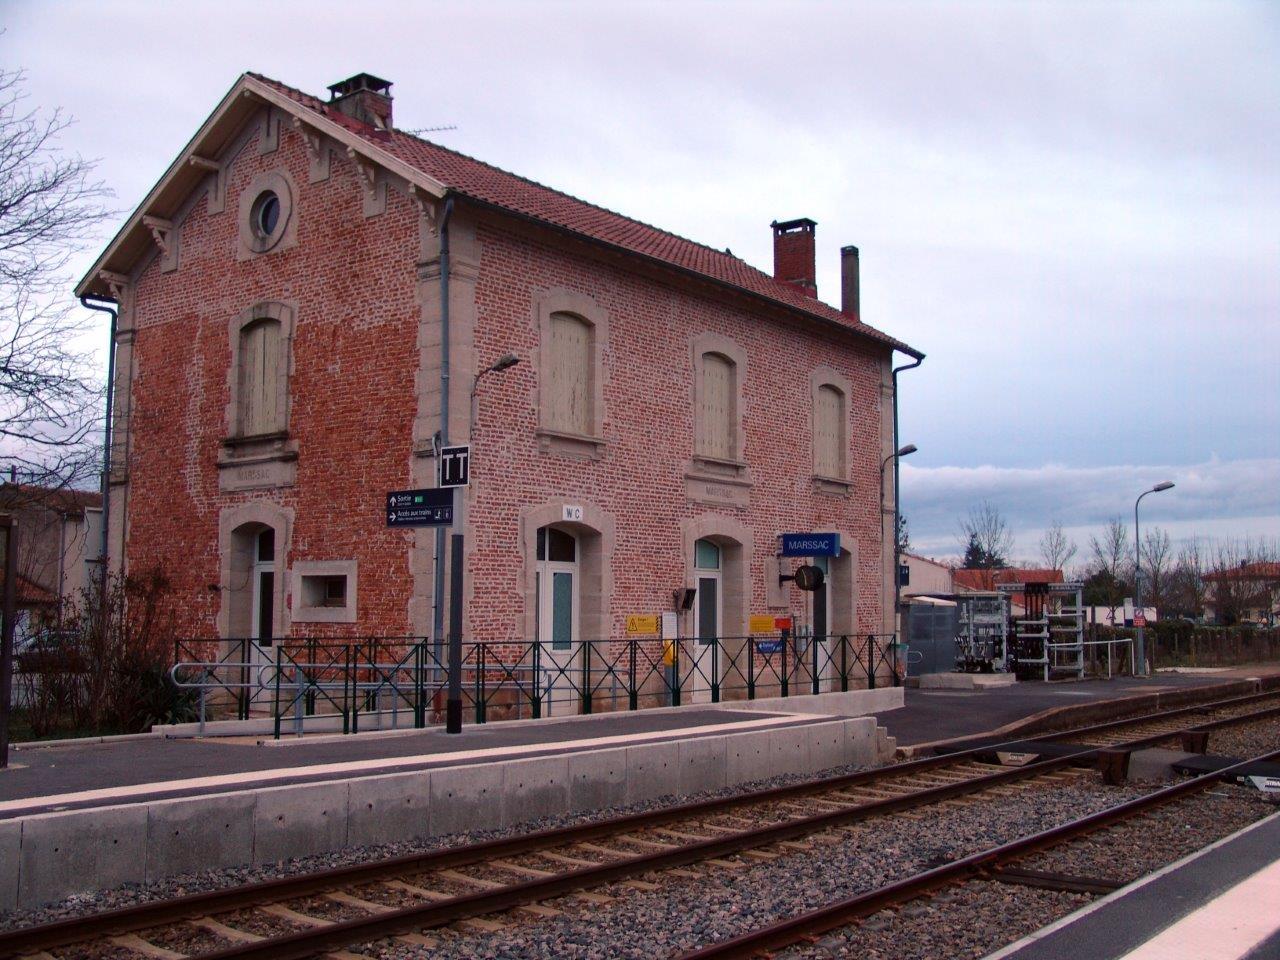 gare-de-marssac-sur-tarn-train-station